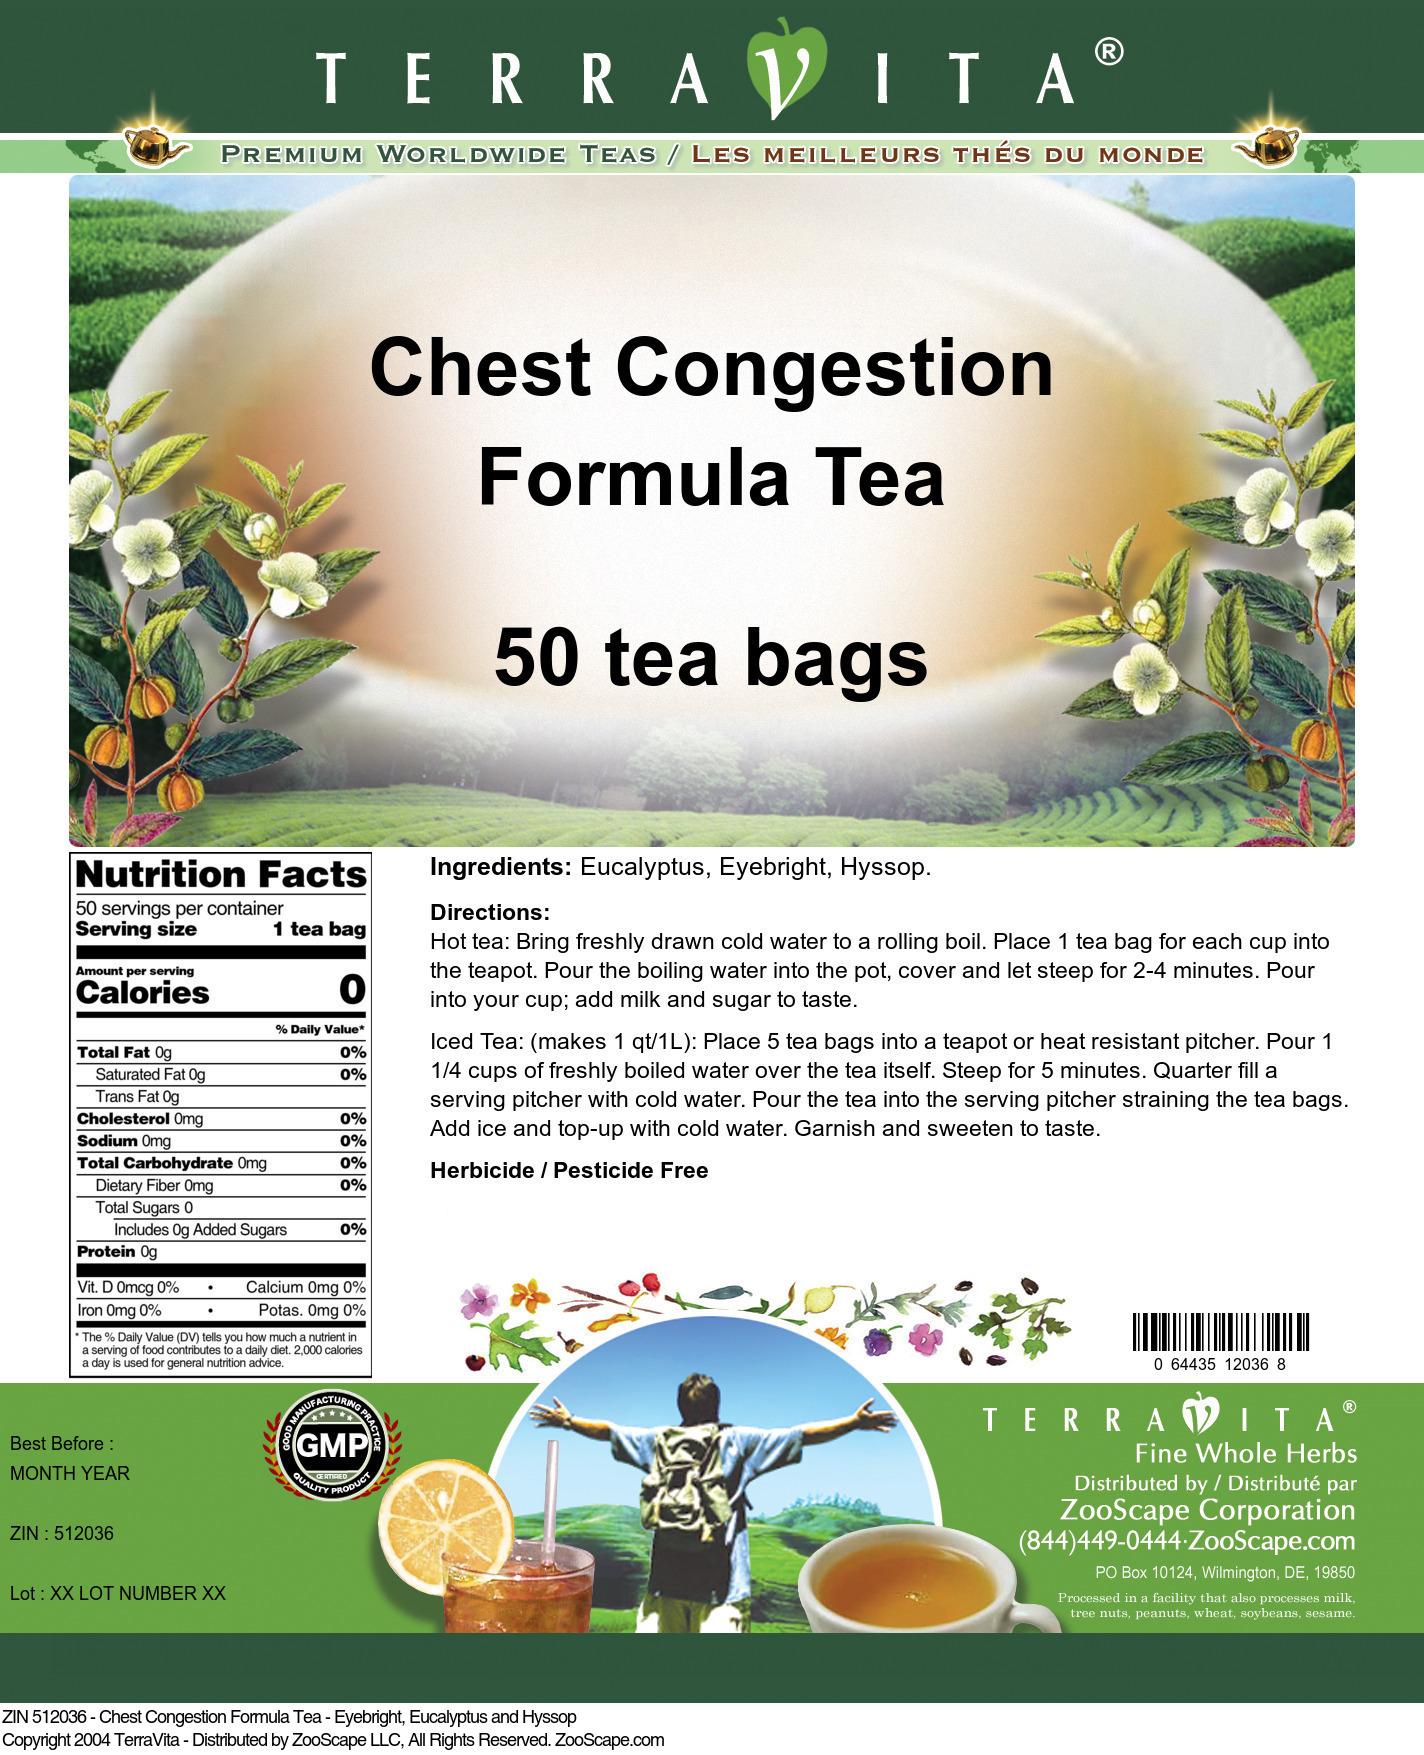 Chest Congestion Formula Tea - Eyebright, Eucalyptus and Hyssop